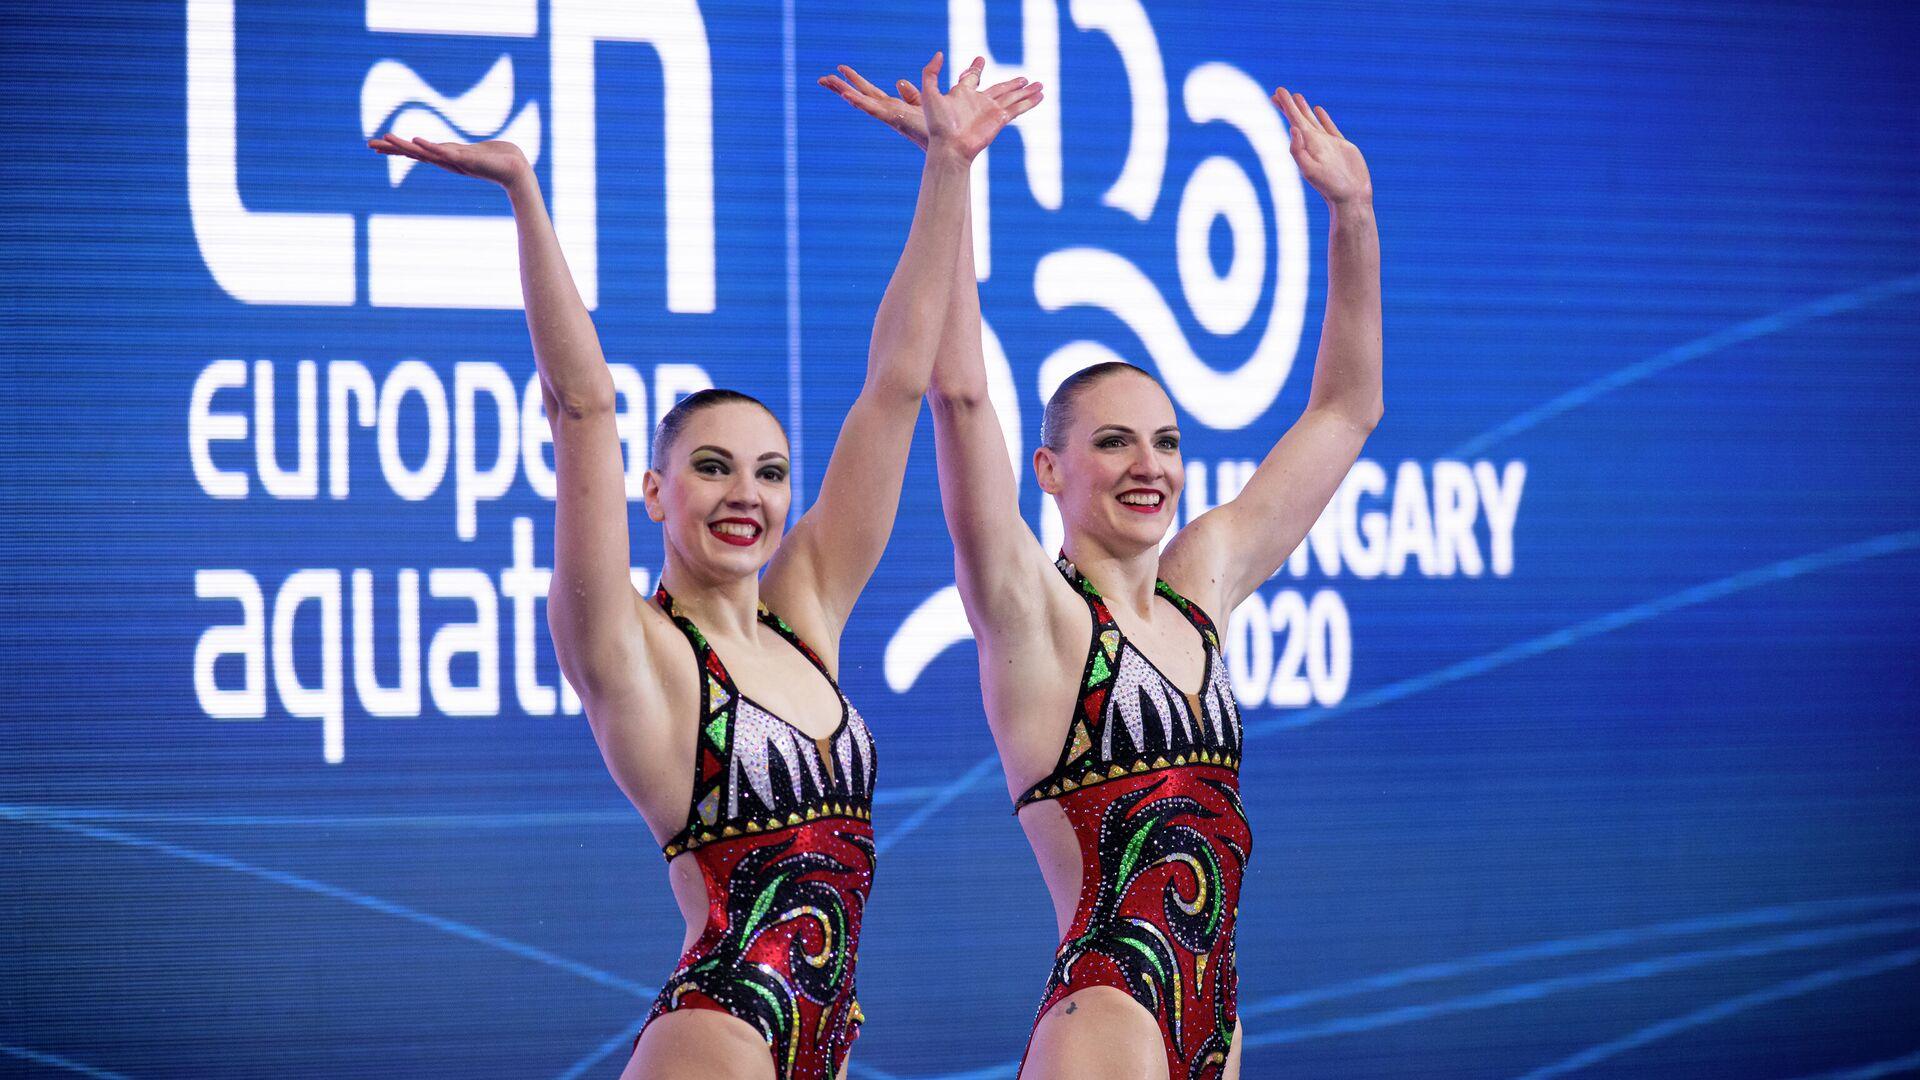 Светлана Колесниченко и Светлана Ромашина - РИА Новости, 1920, 01.07.2021